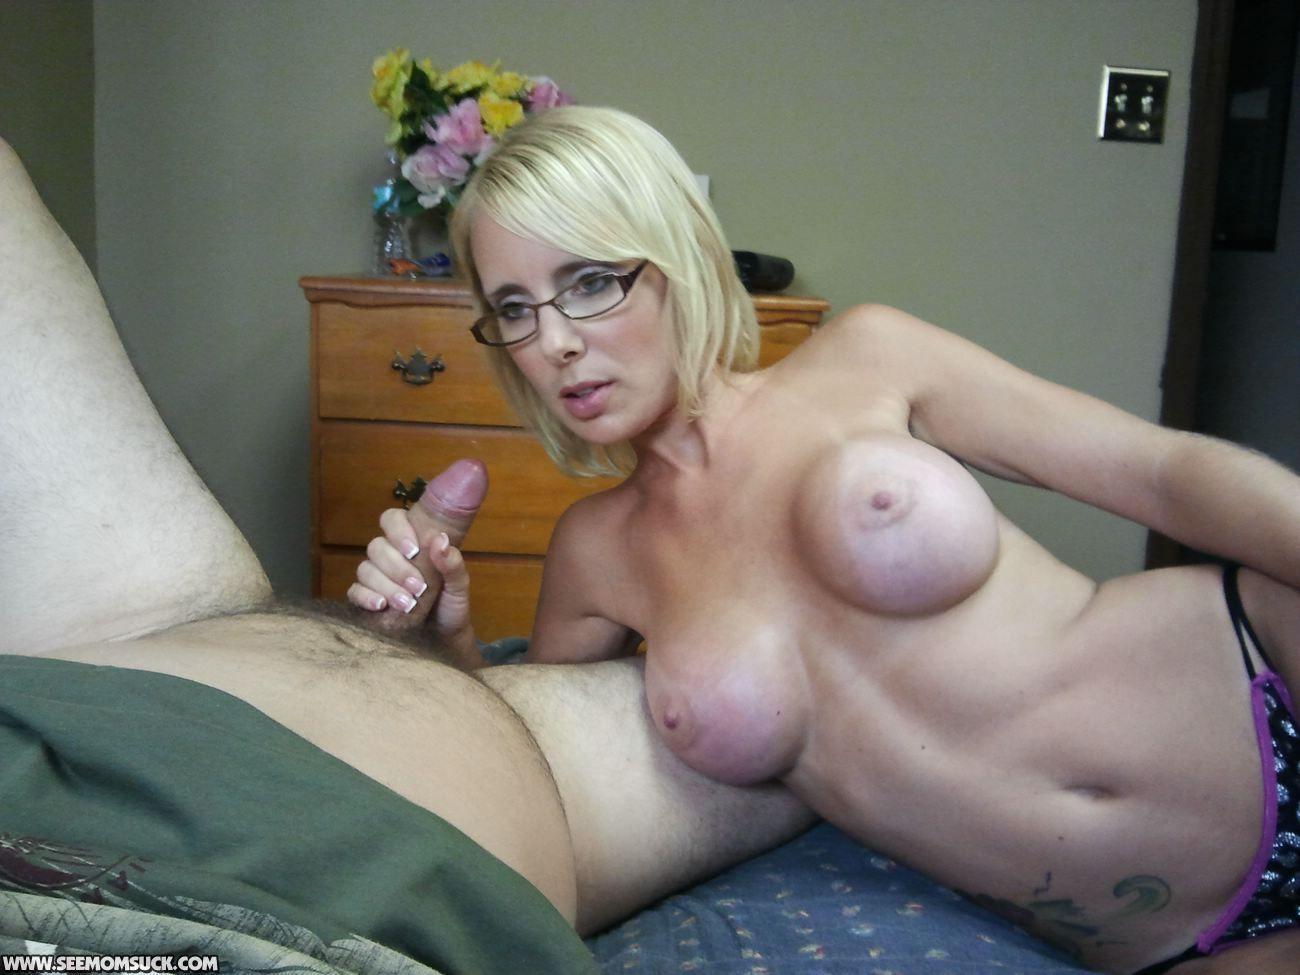 Mum Moie Porn Mature mature mom sucks a huge cock . hot naked pics.